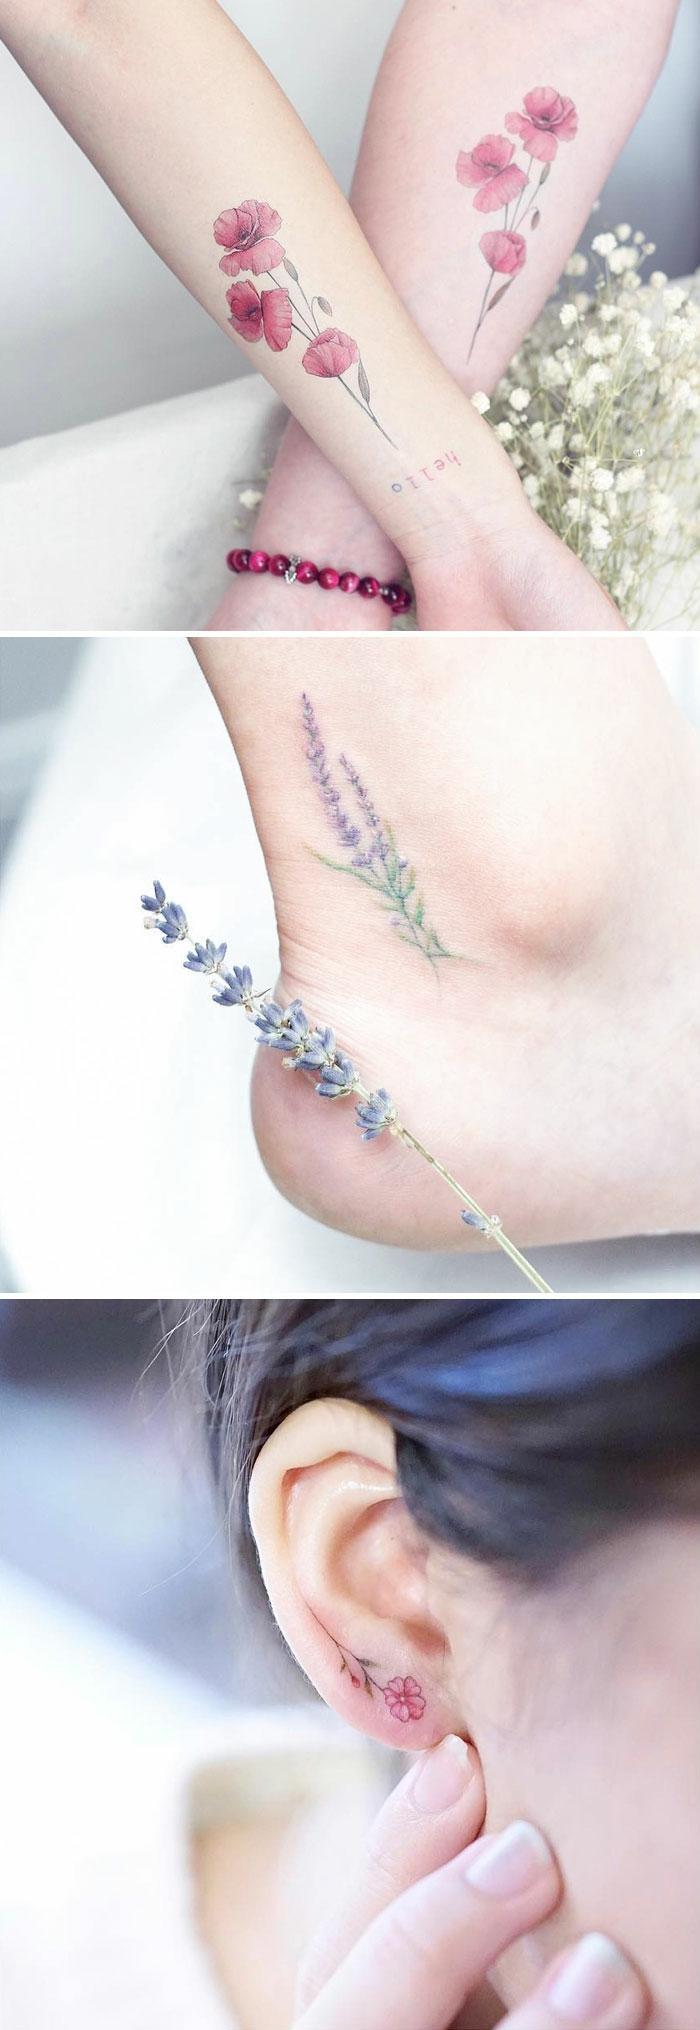 Joli tatouage fleur d hibiscus ou pivoine tatouage magnifique